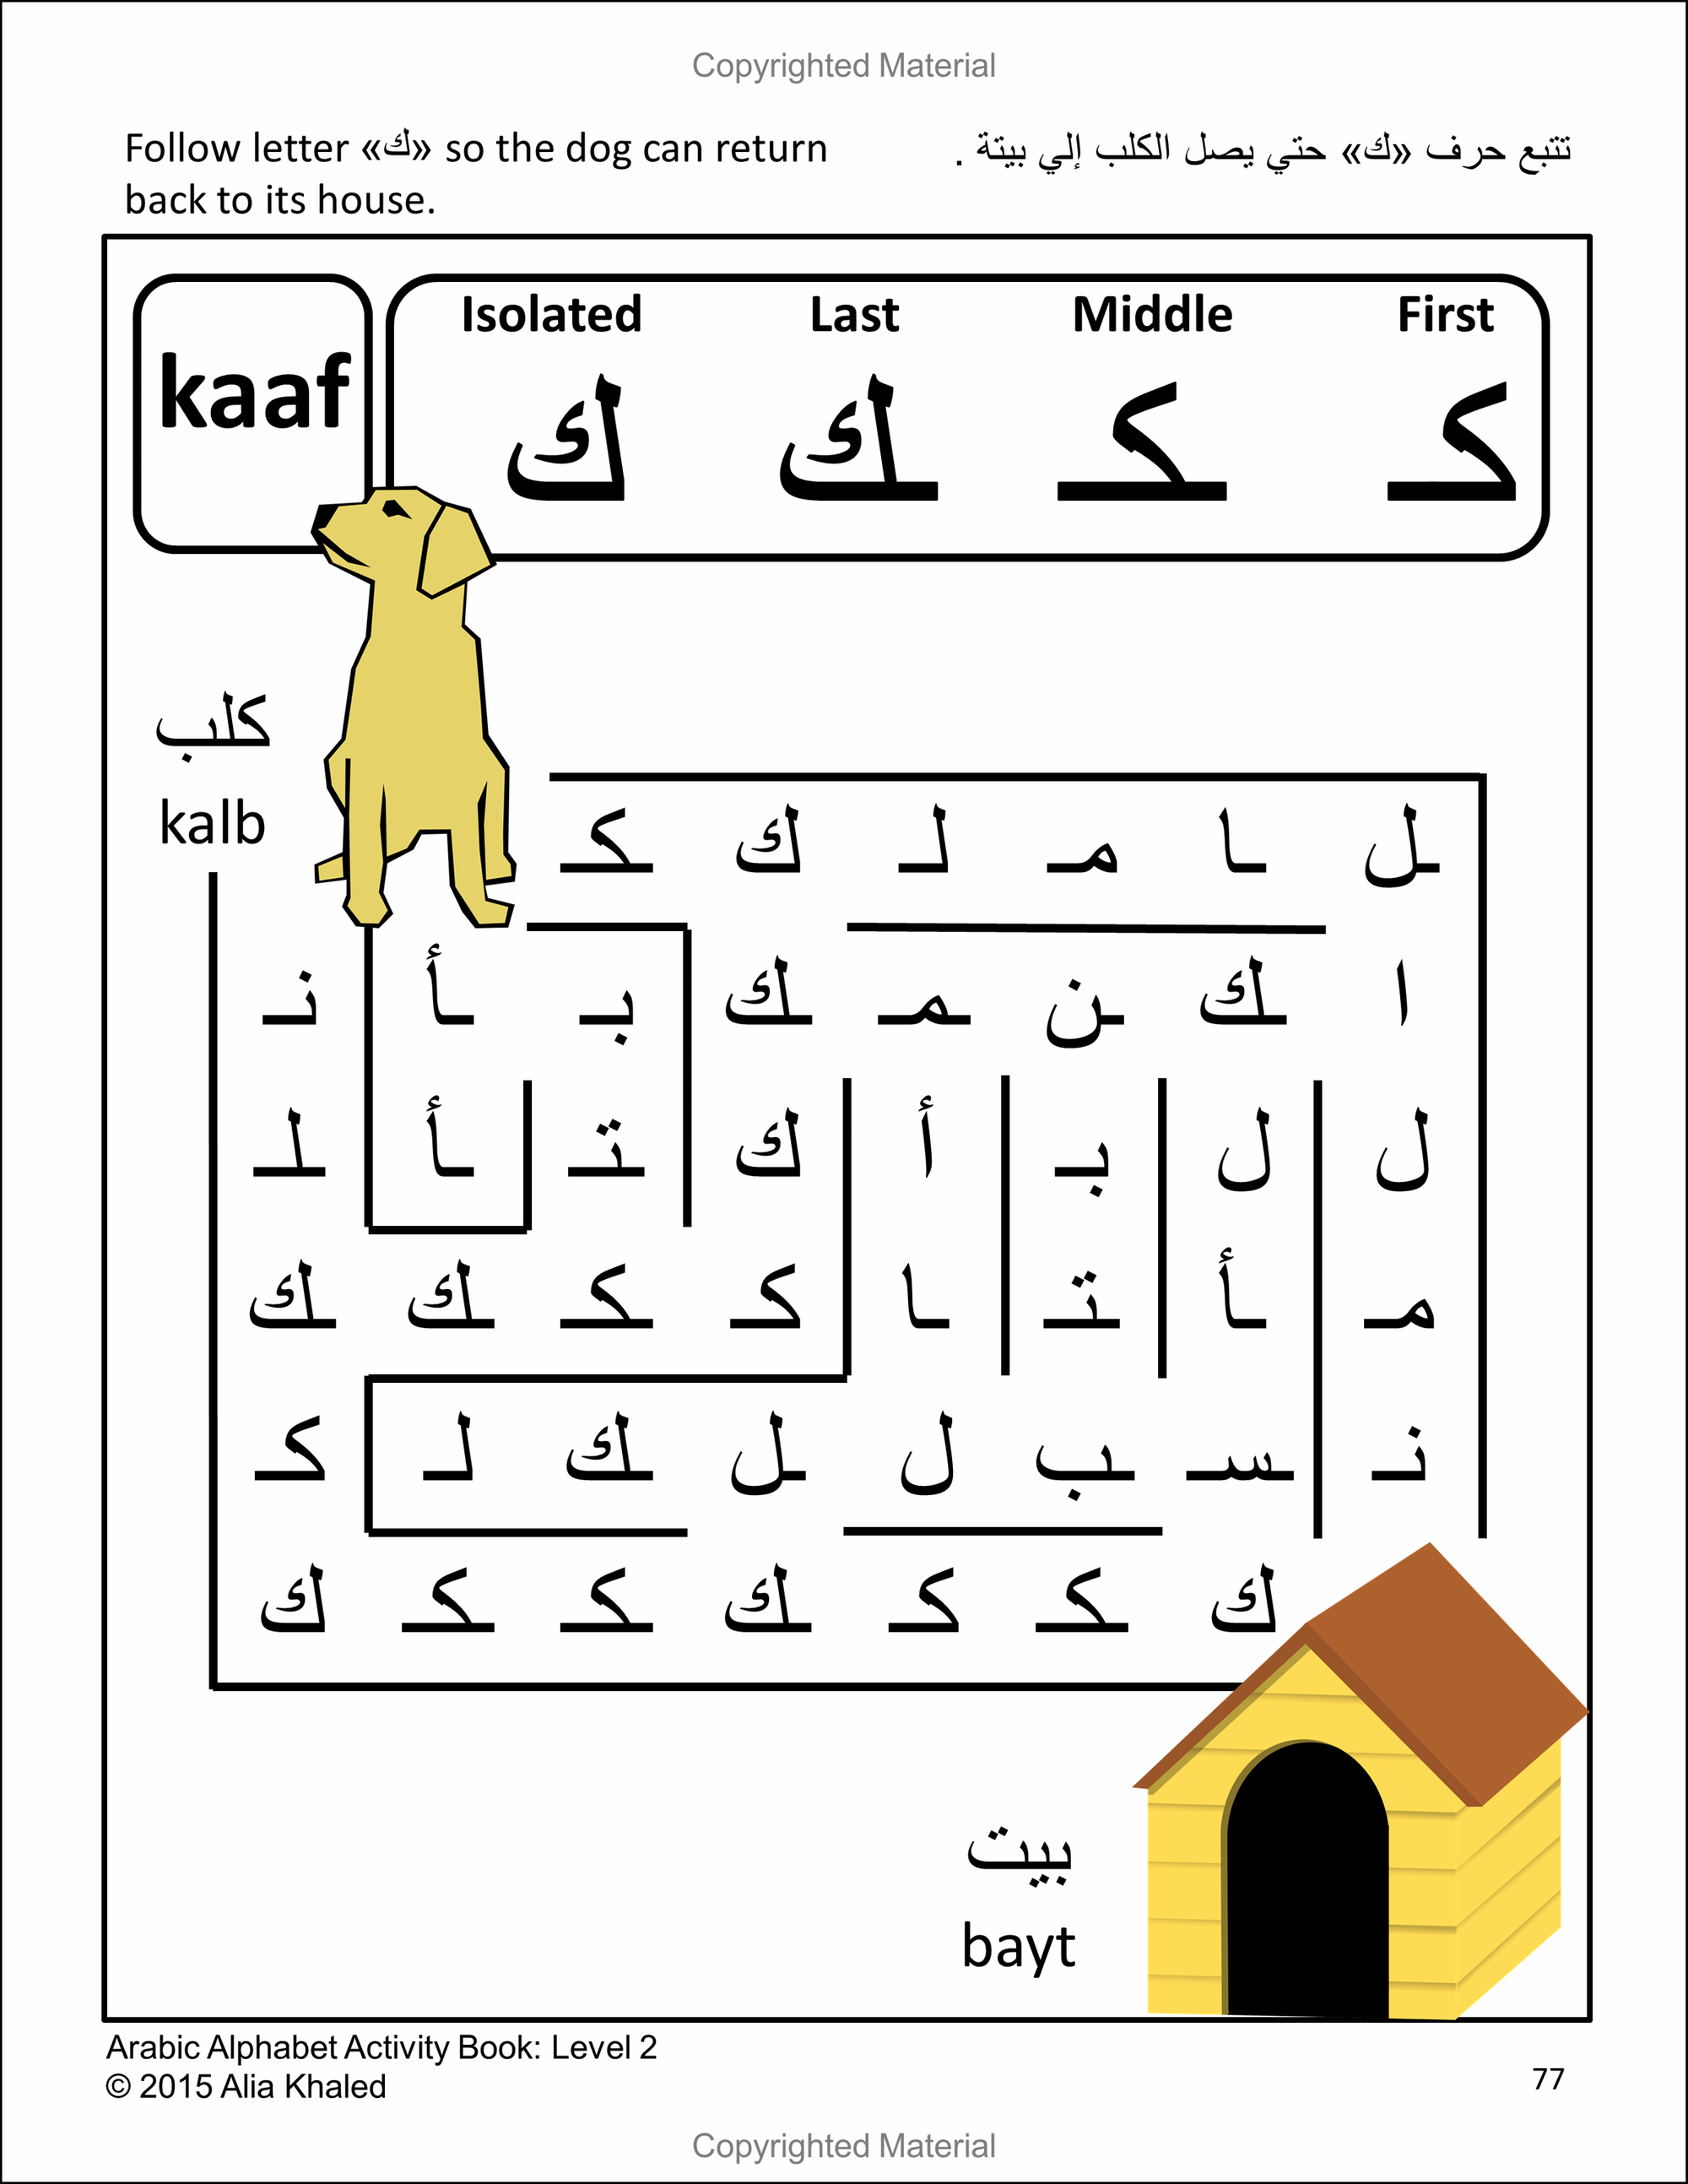 Arabic Alphabet Activity Book Level 2 Colored Edition